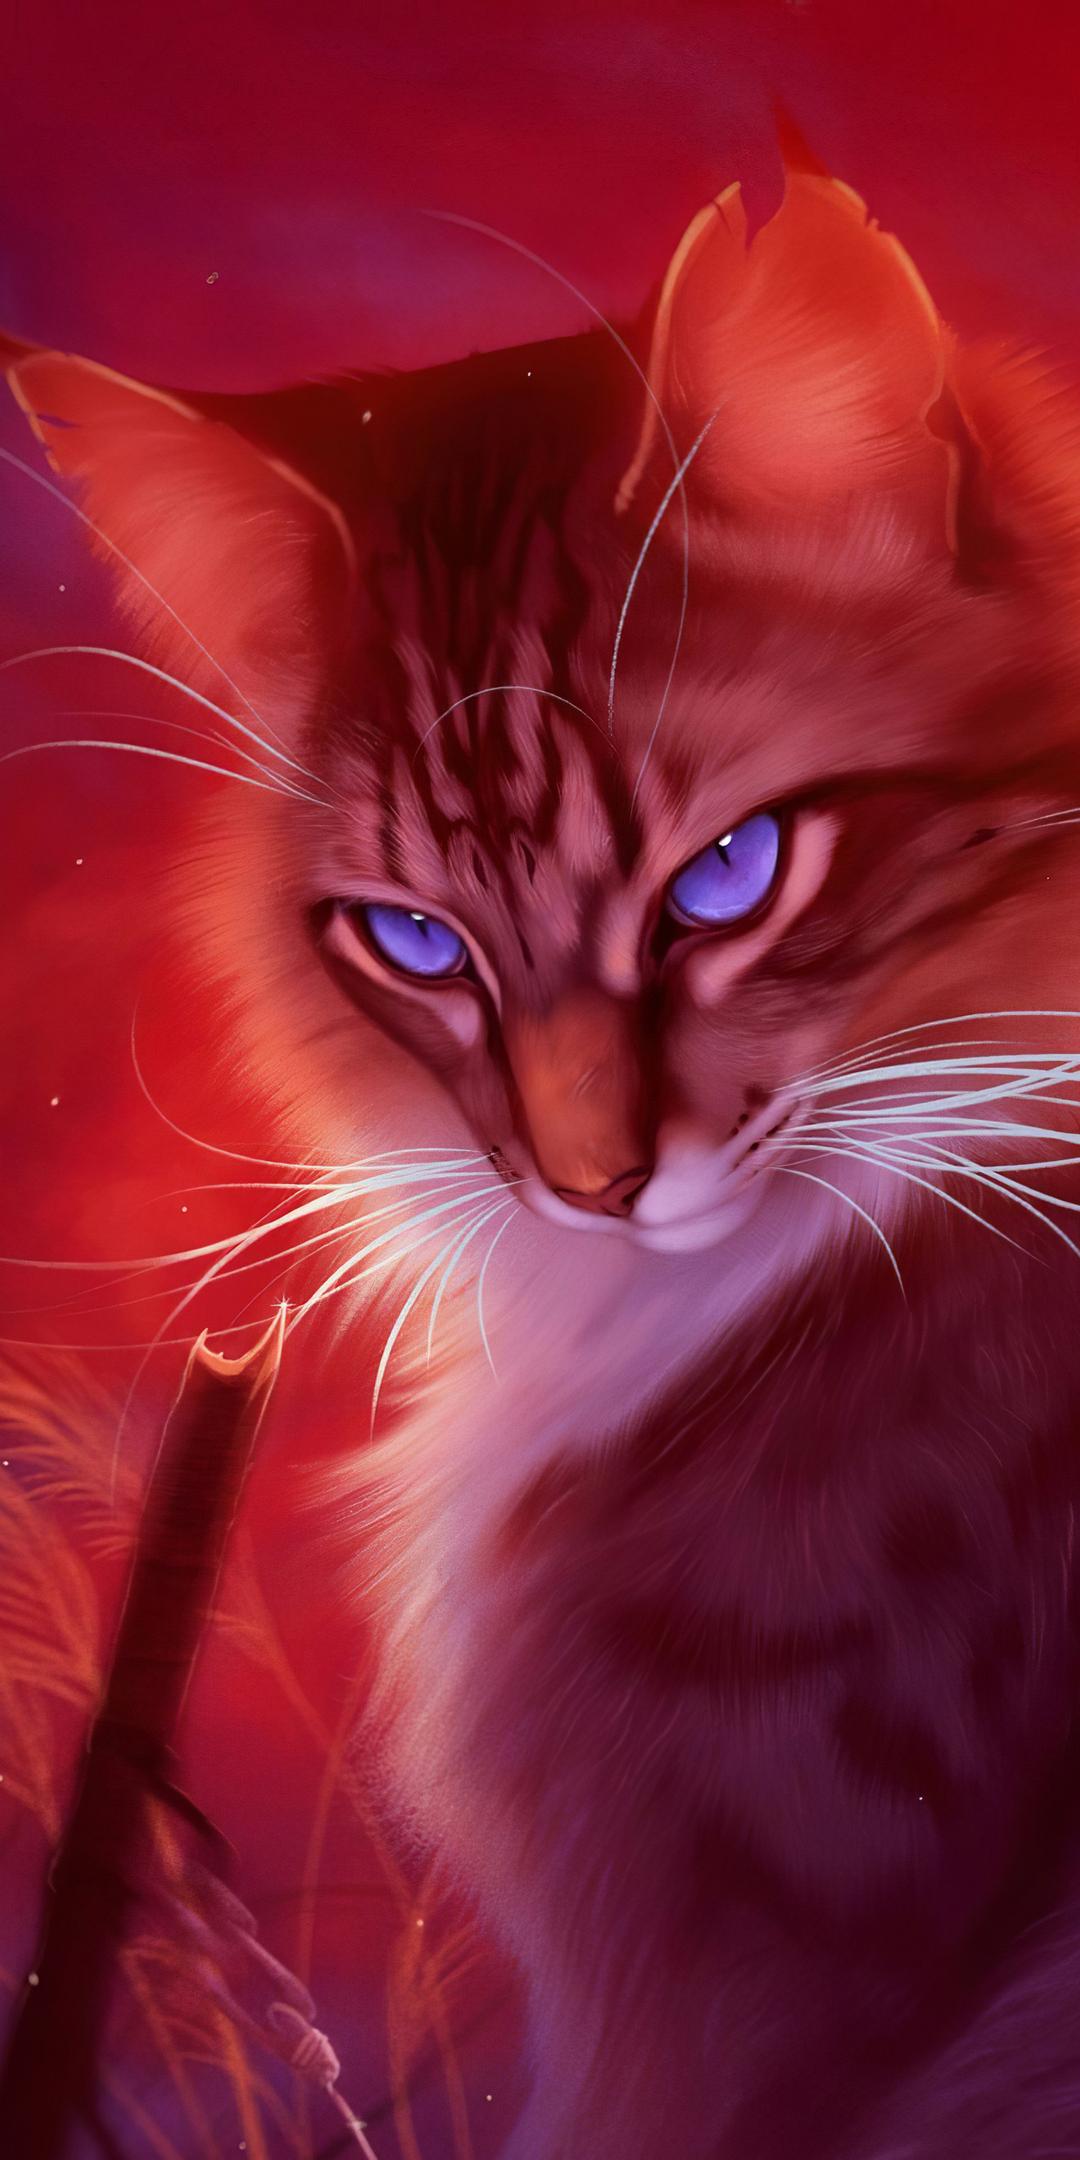 cat-artwork-4k-p5.jpg